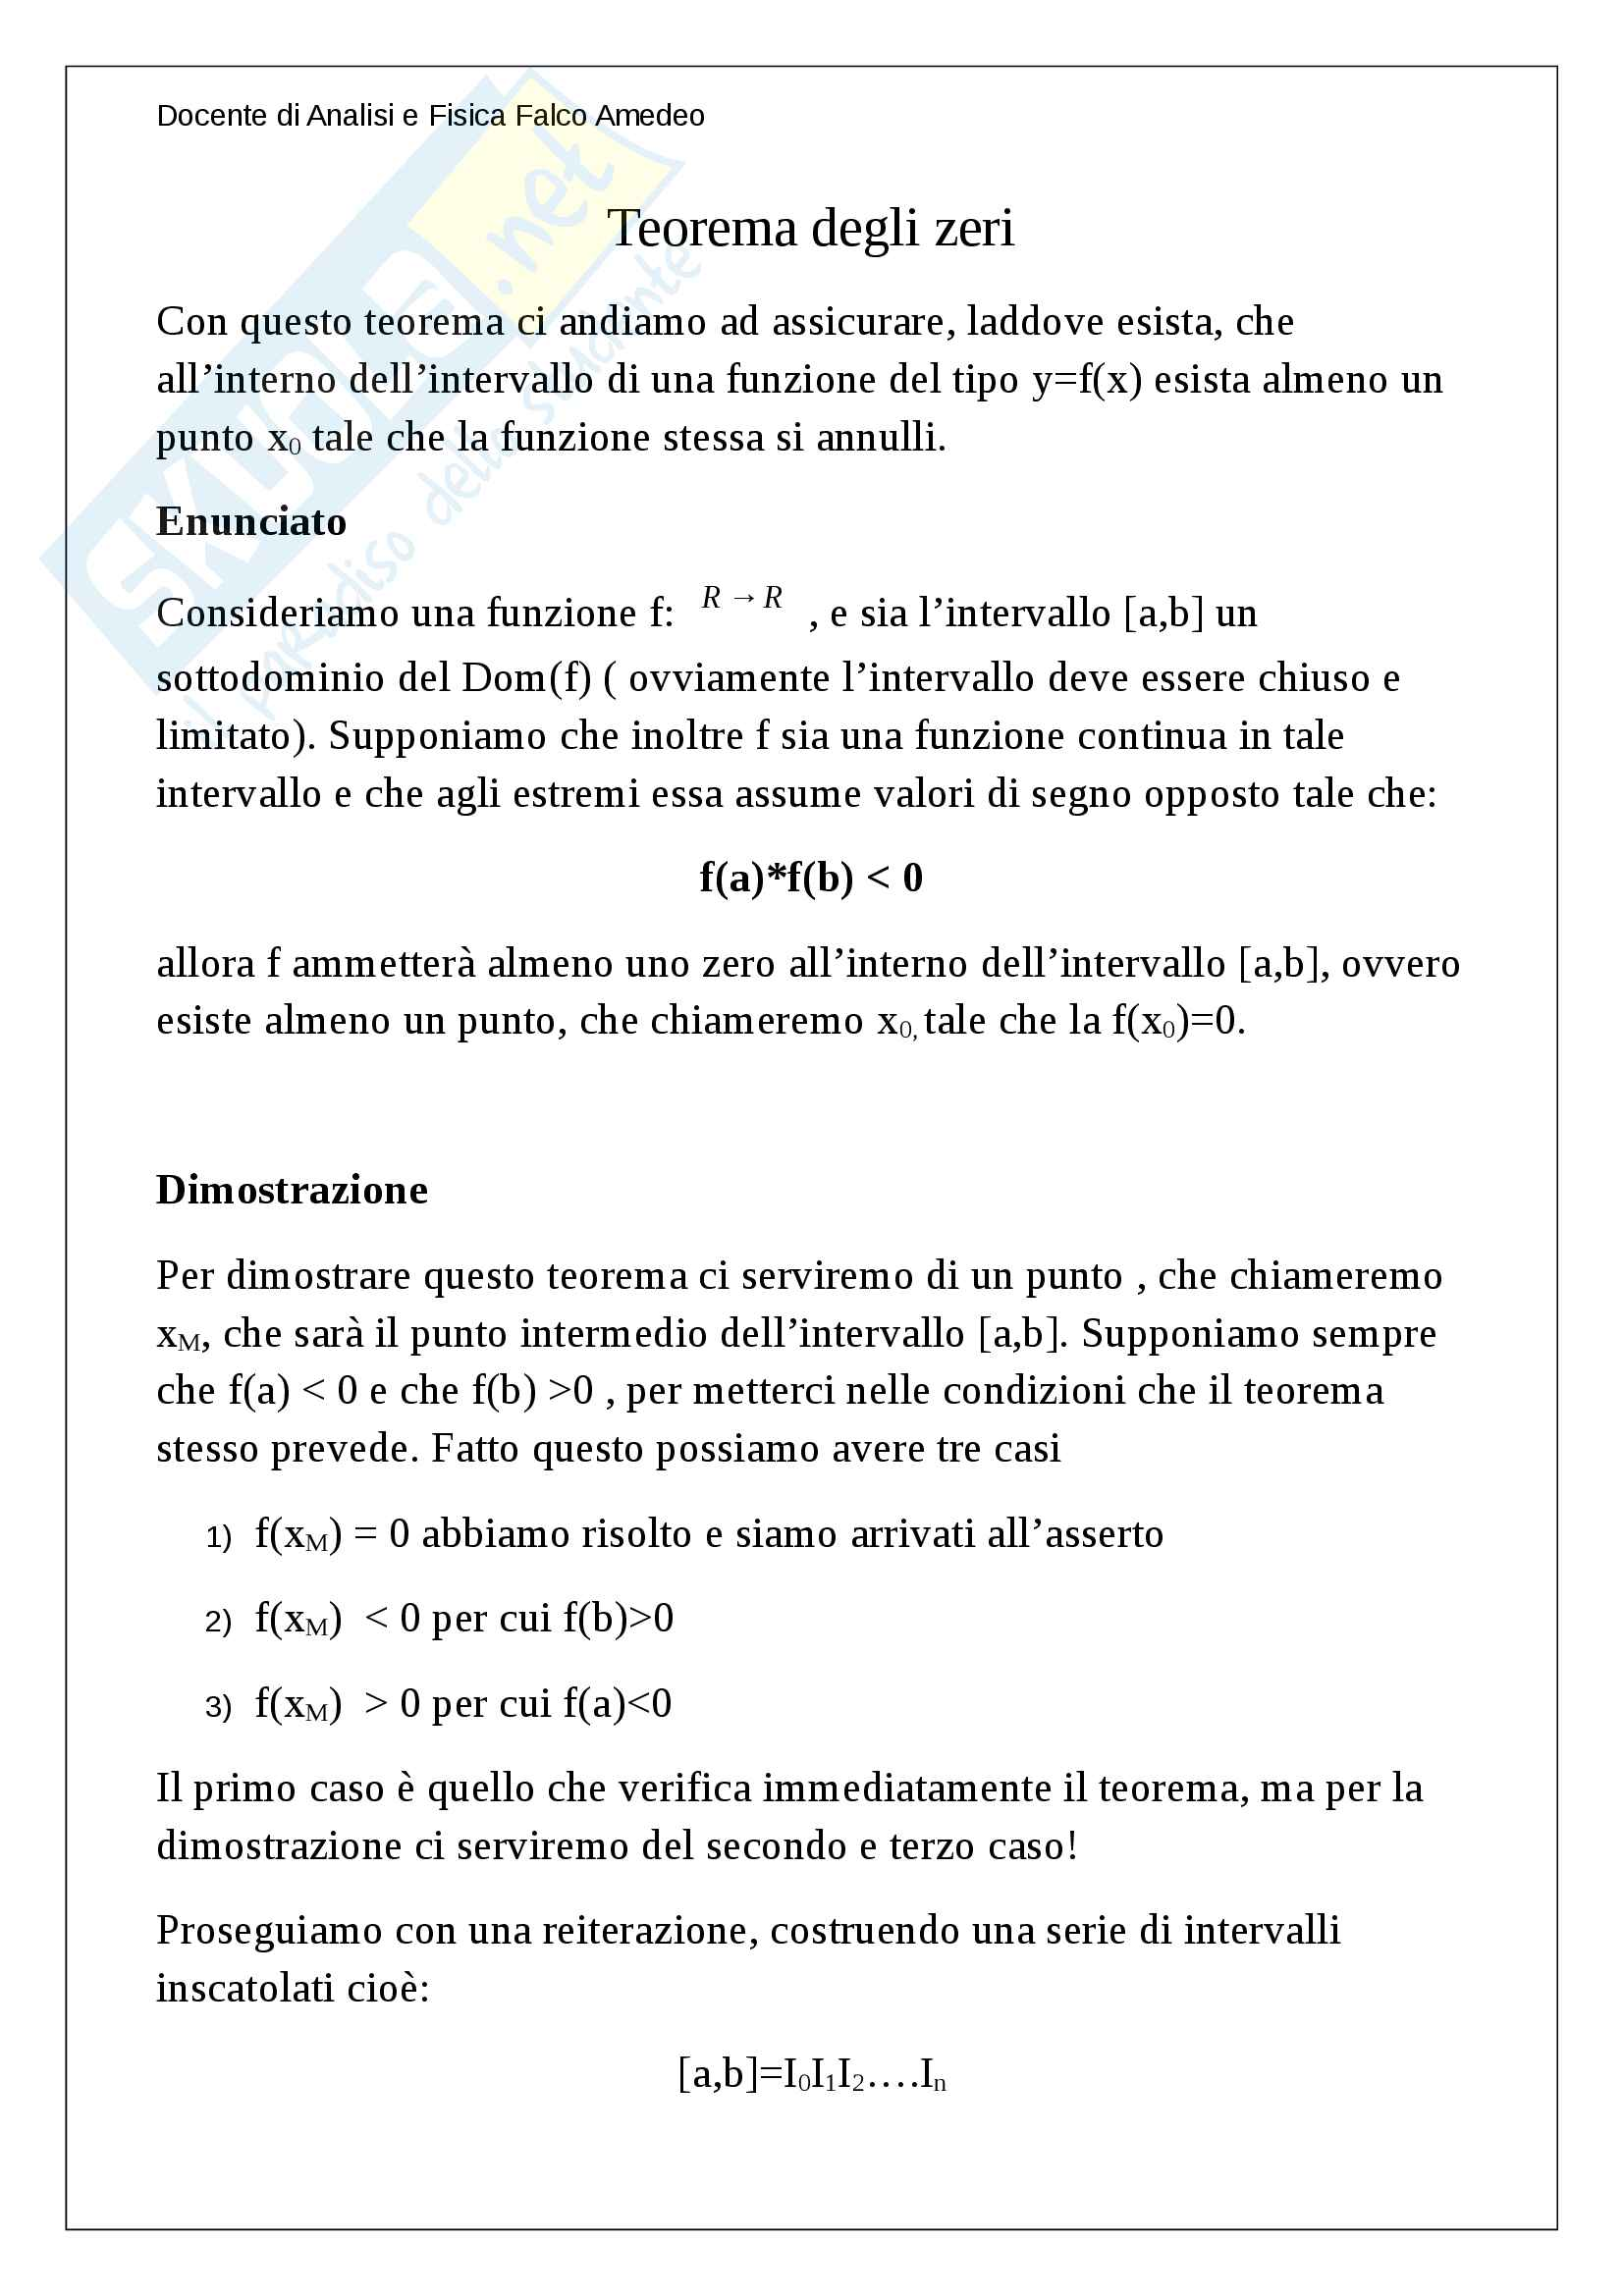 Teorema degli zeri